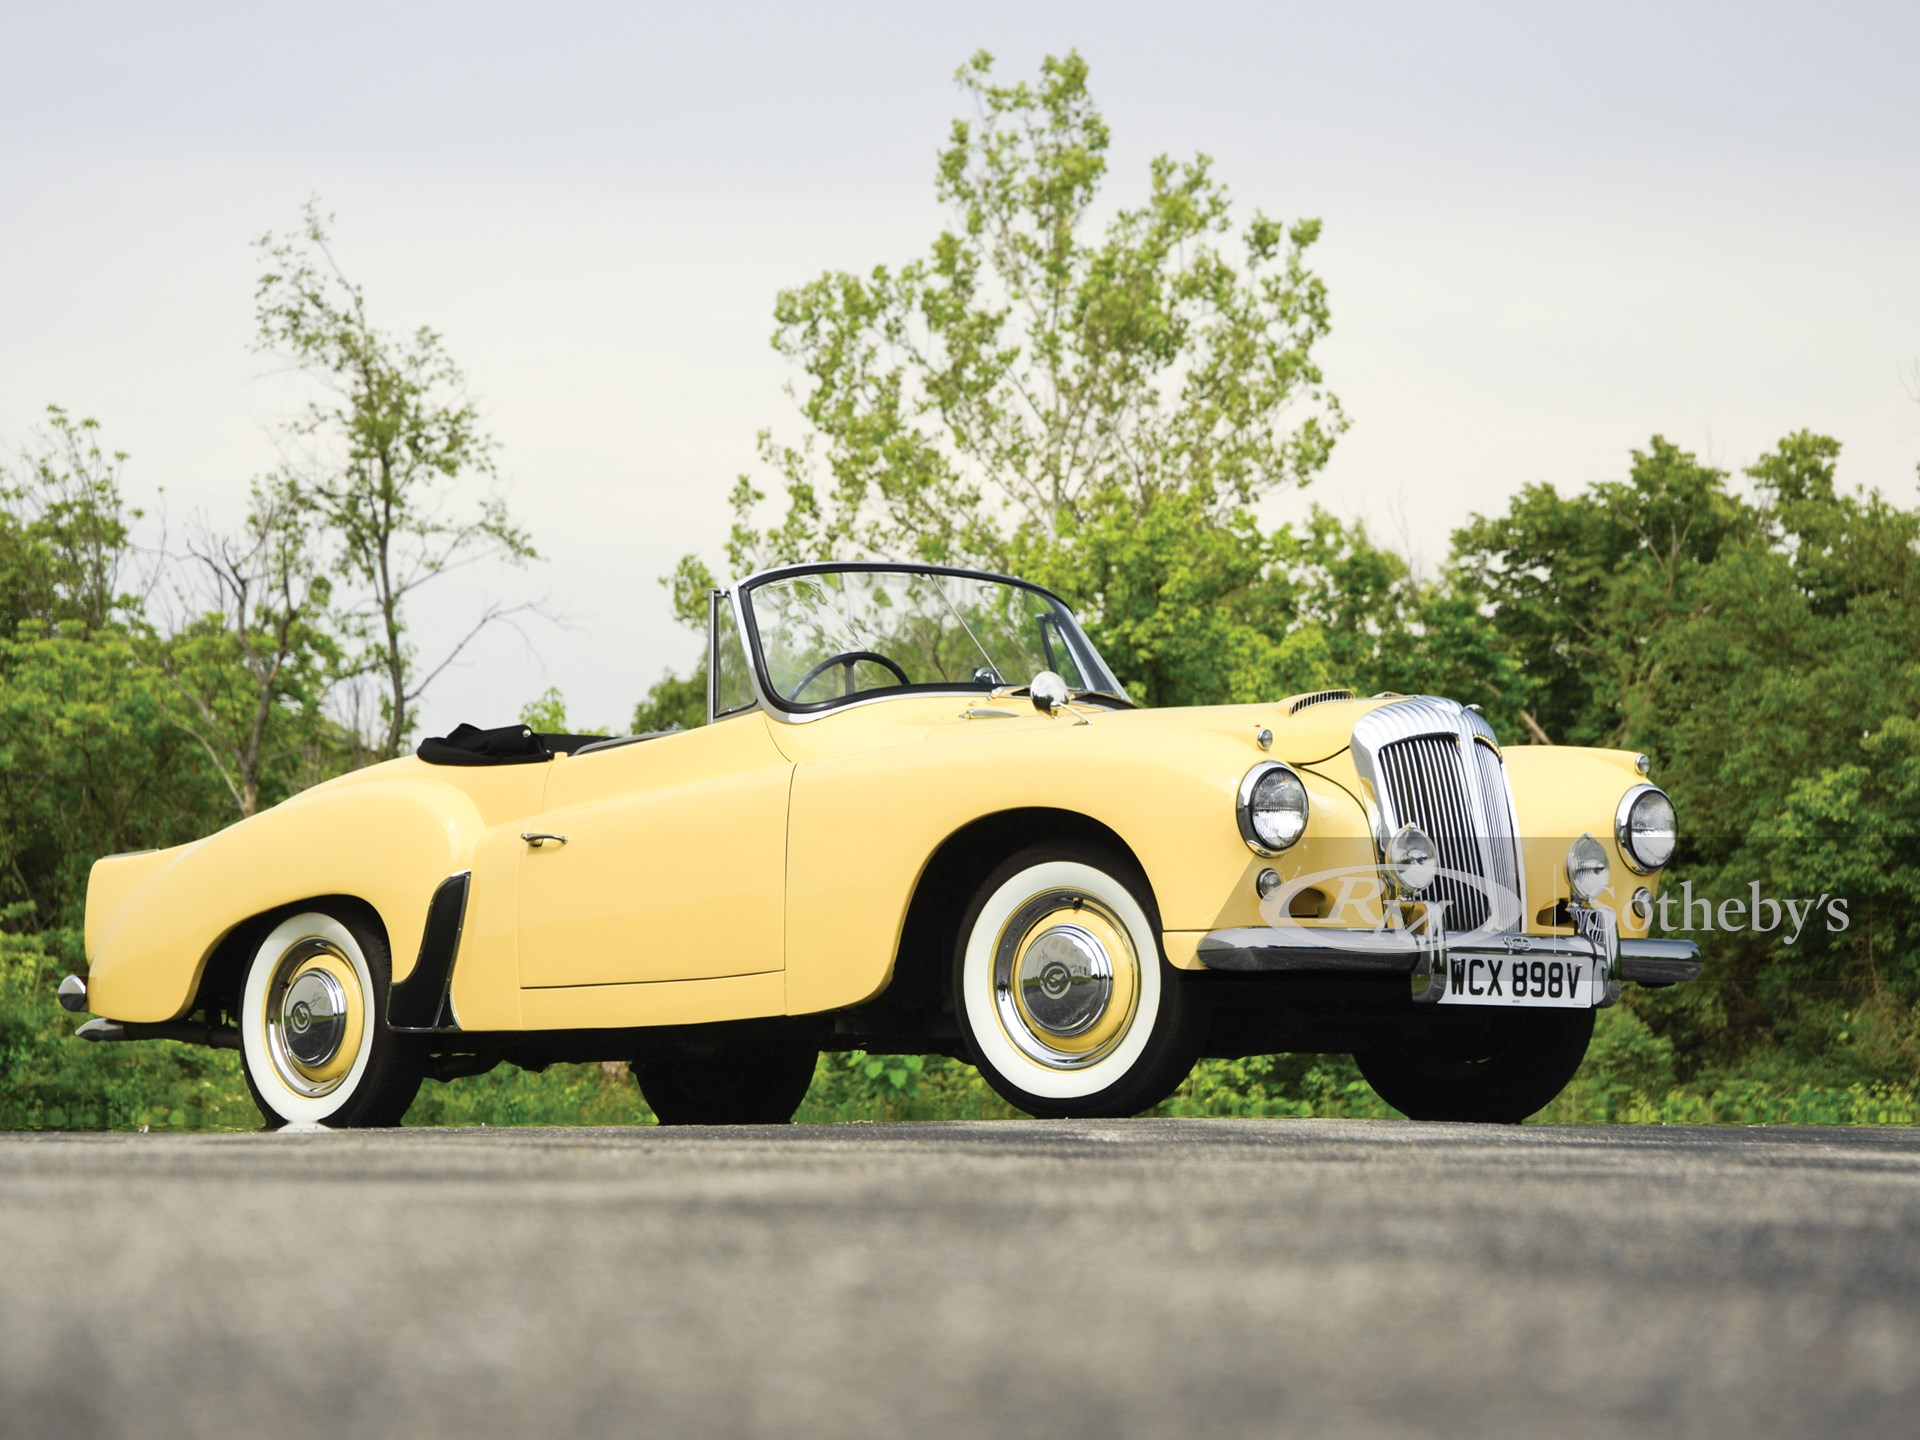 1957 Daimler Conquest Century New Drophead Coupe